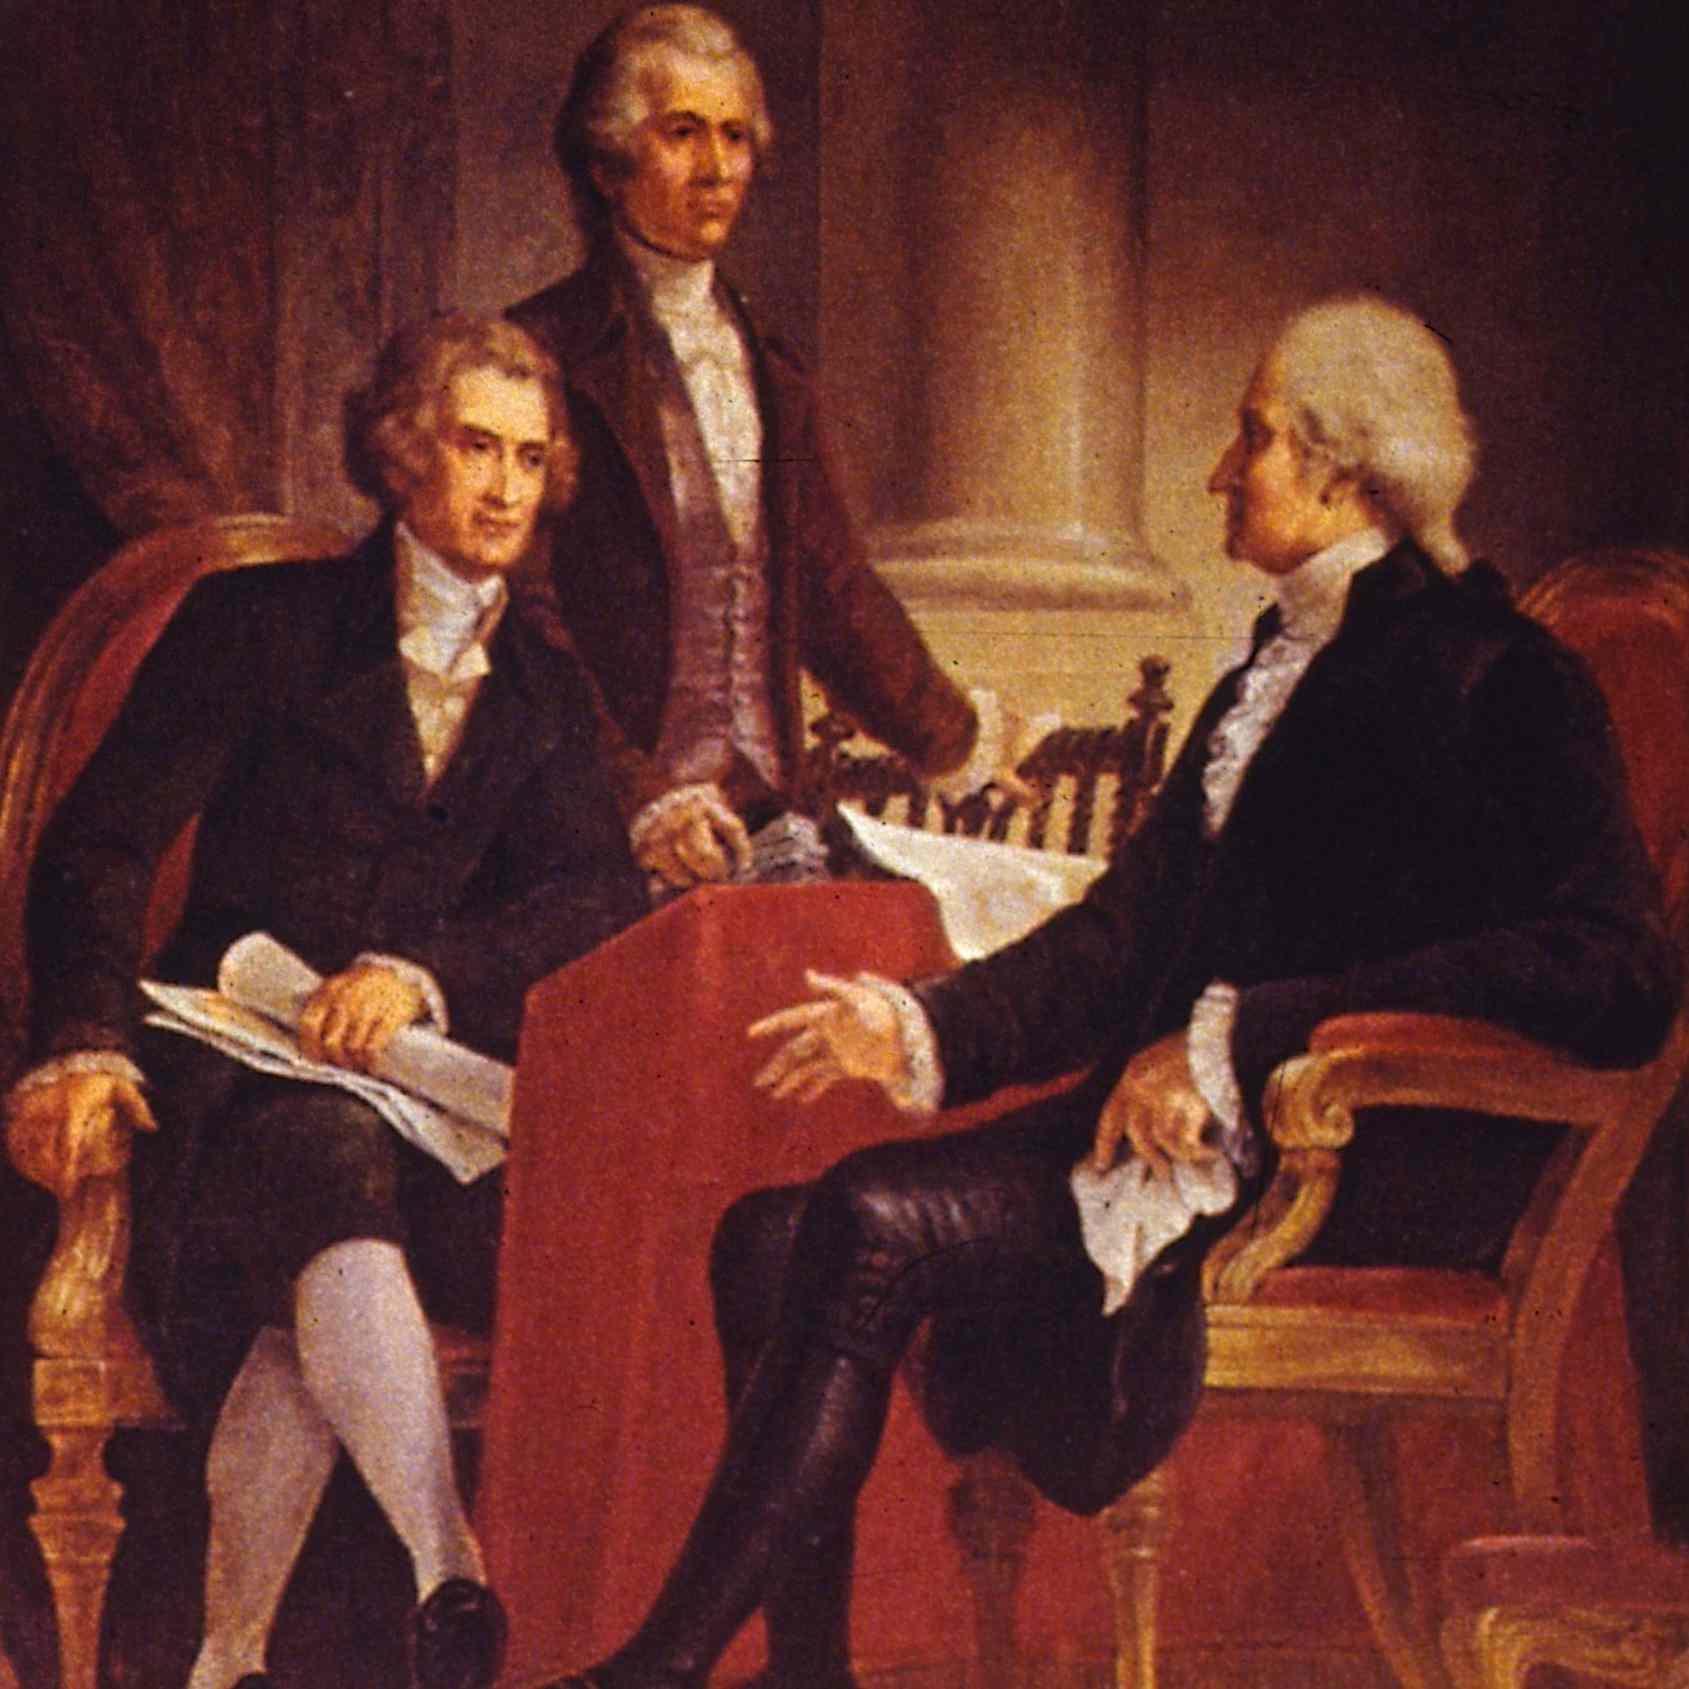 George Washington, Thomas Jefferson, and Alexander Hamilton